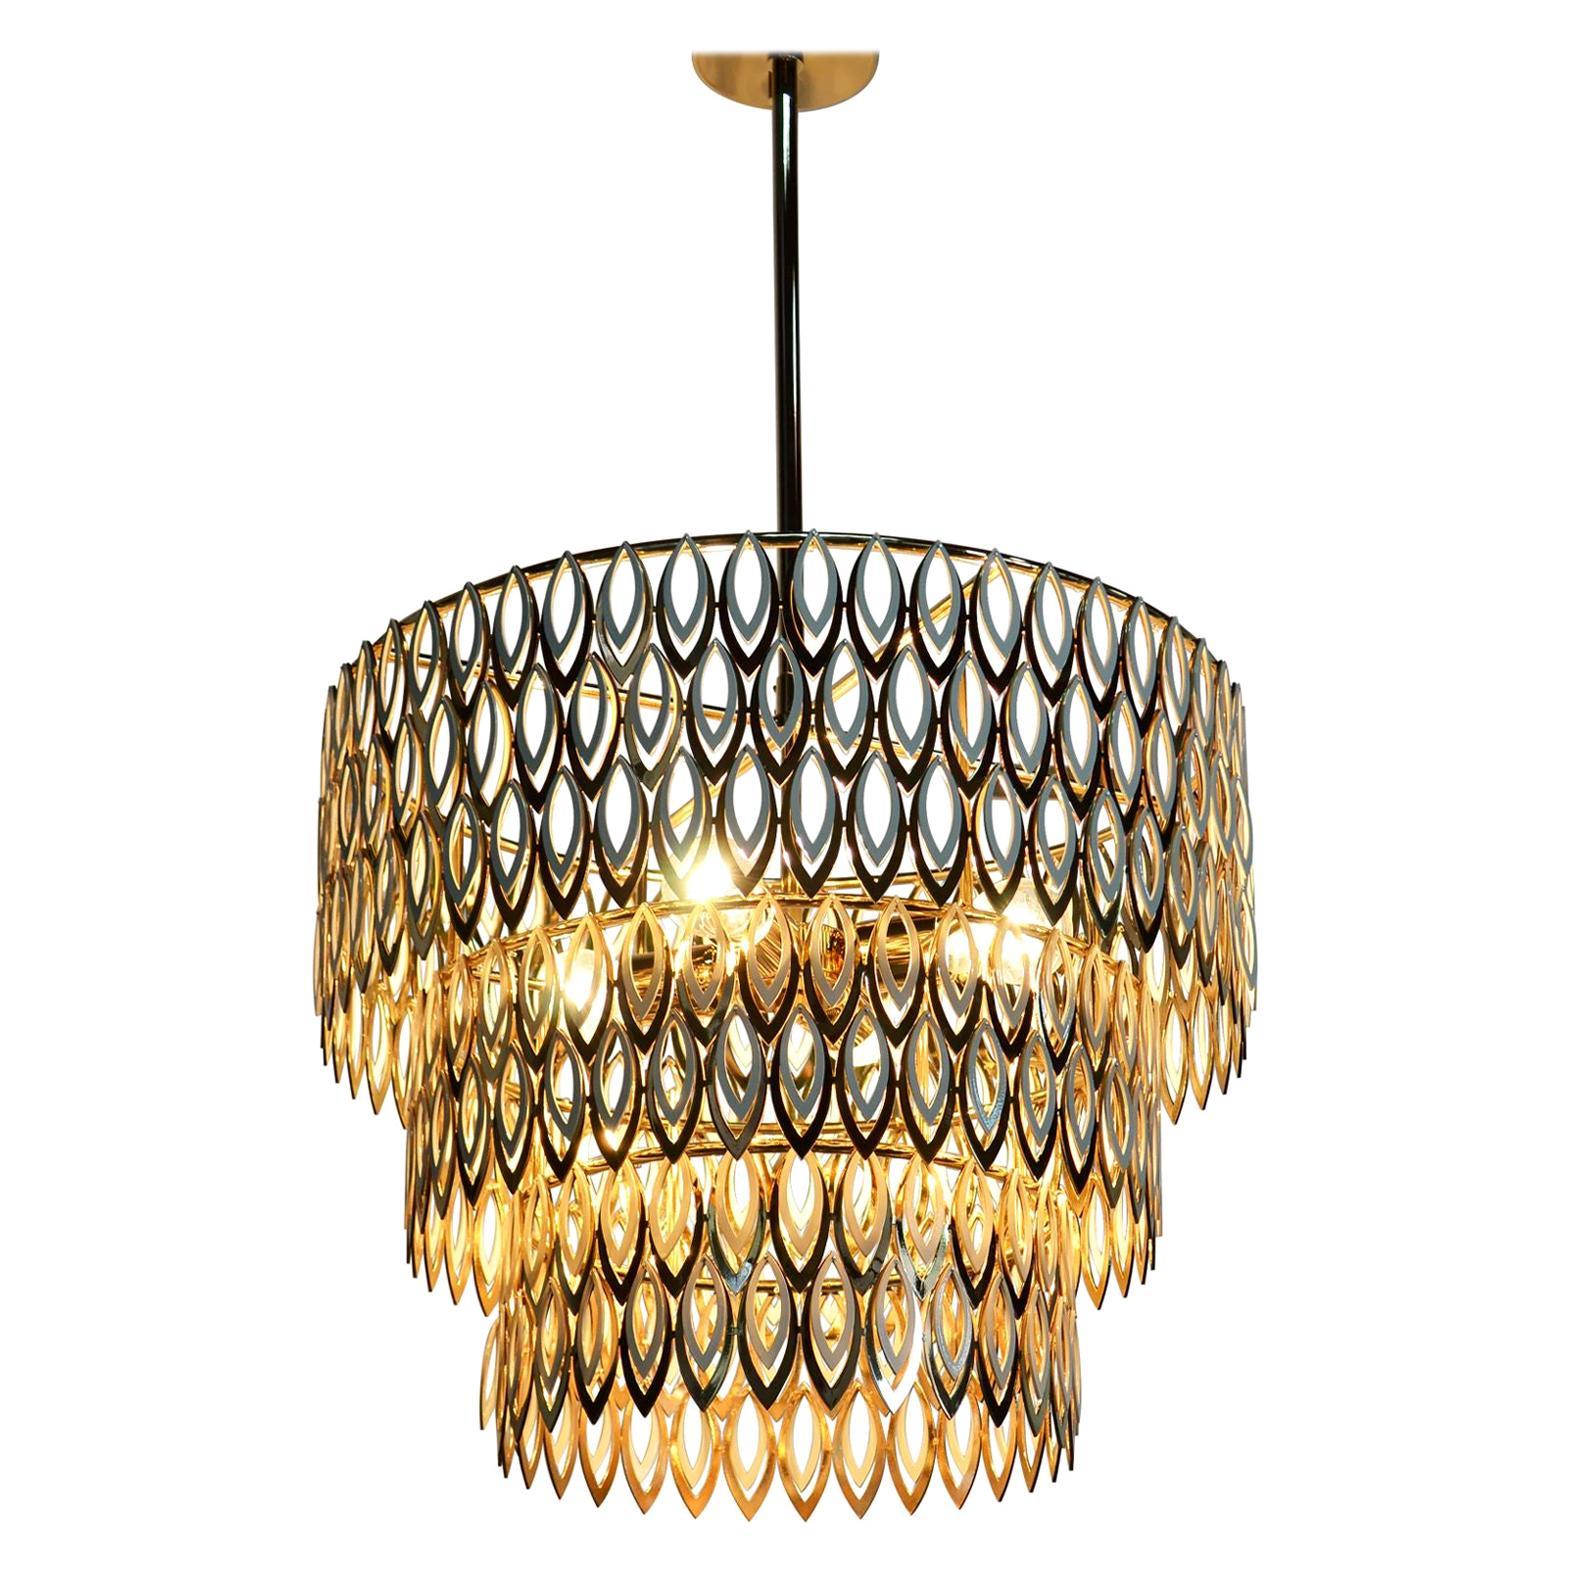 21st Century Petal Suspension Lamp Stainless Steel